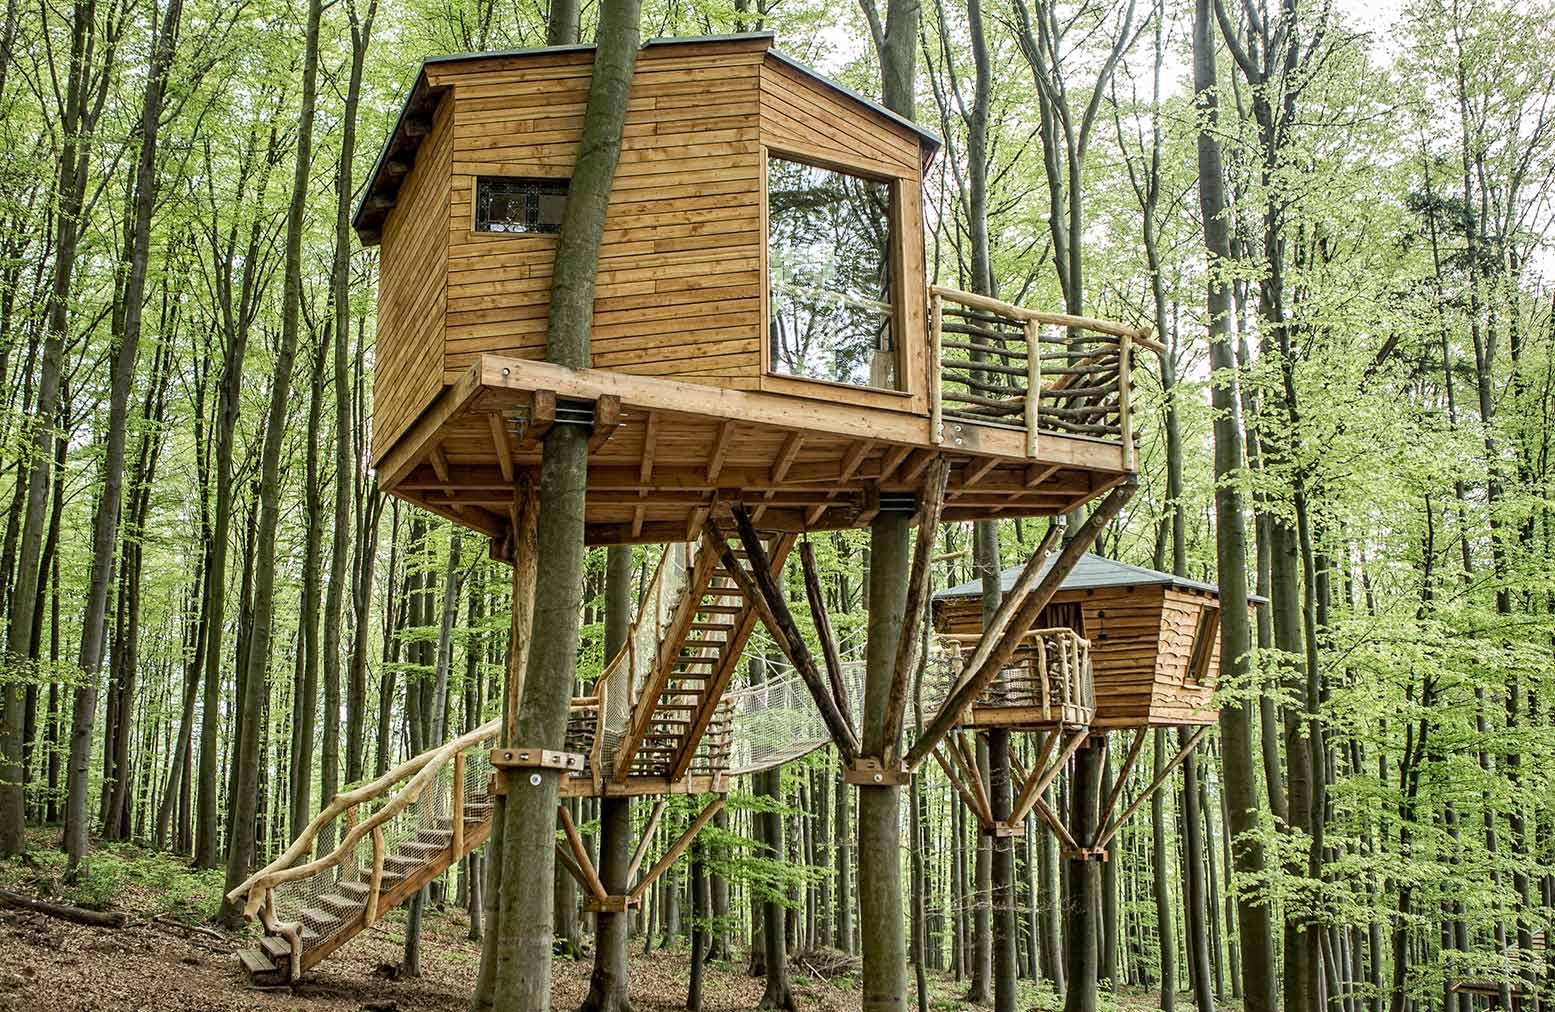 http-__www.robins-nest.de_kork-baumhaus_-lo-res